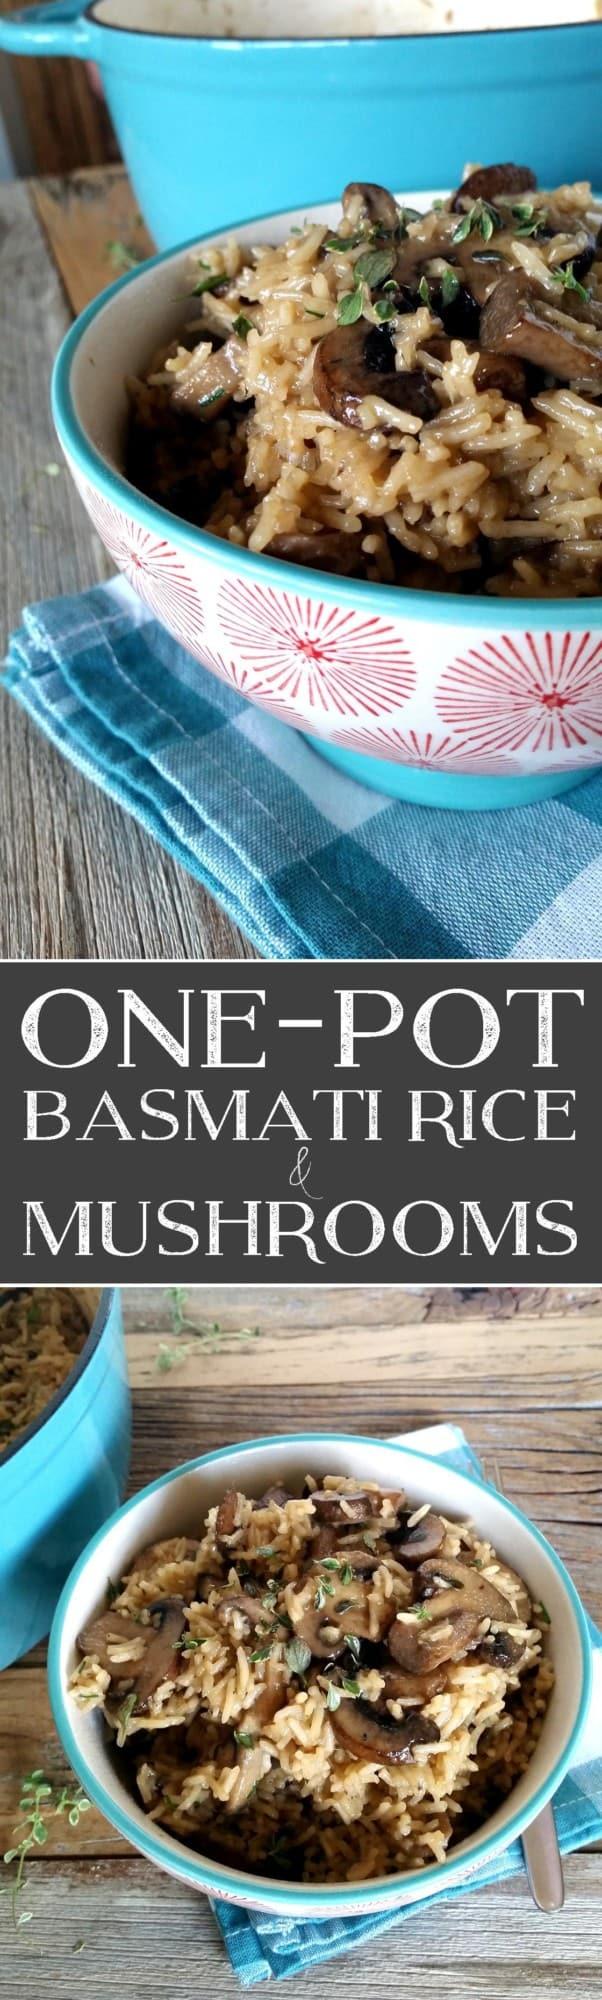 One Pot Basmati Ricee and Mushrooms